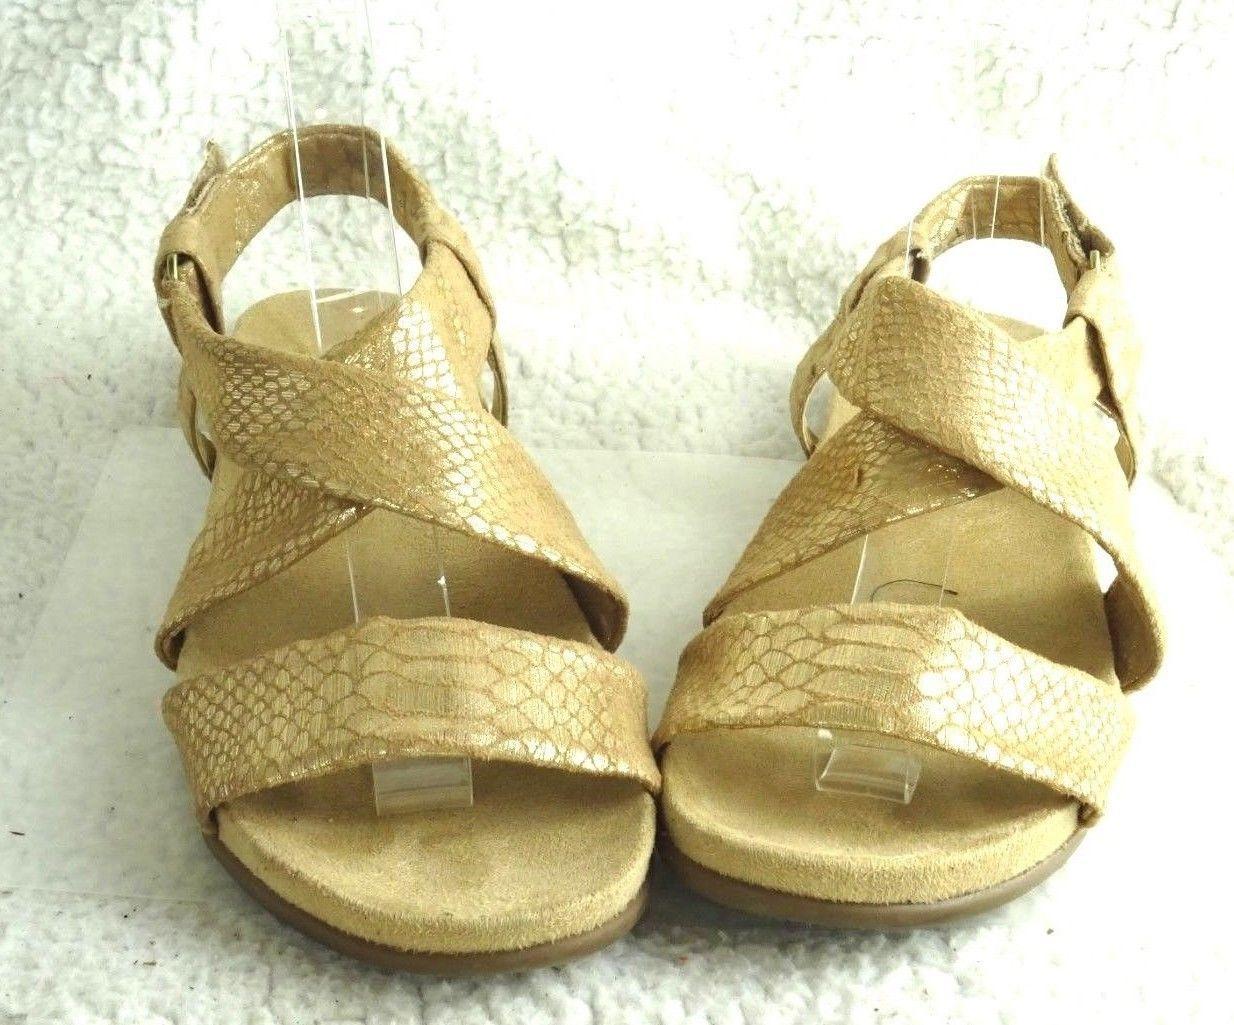 308b45eef925 Naturalizer Ainsley Womens Sz 8 M Light Tan   Gold Canvas Slingback Sandals